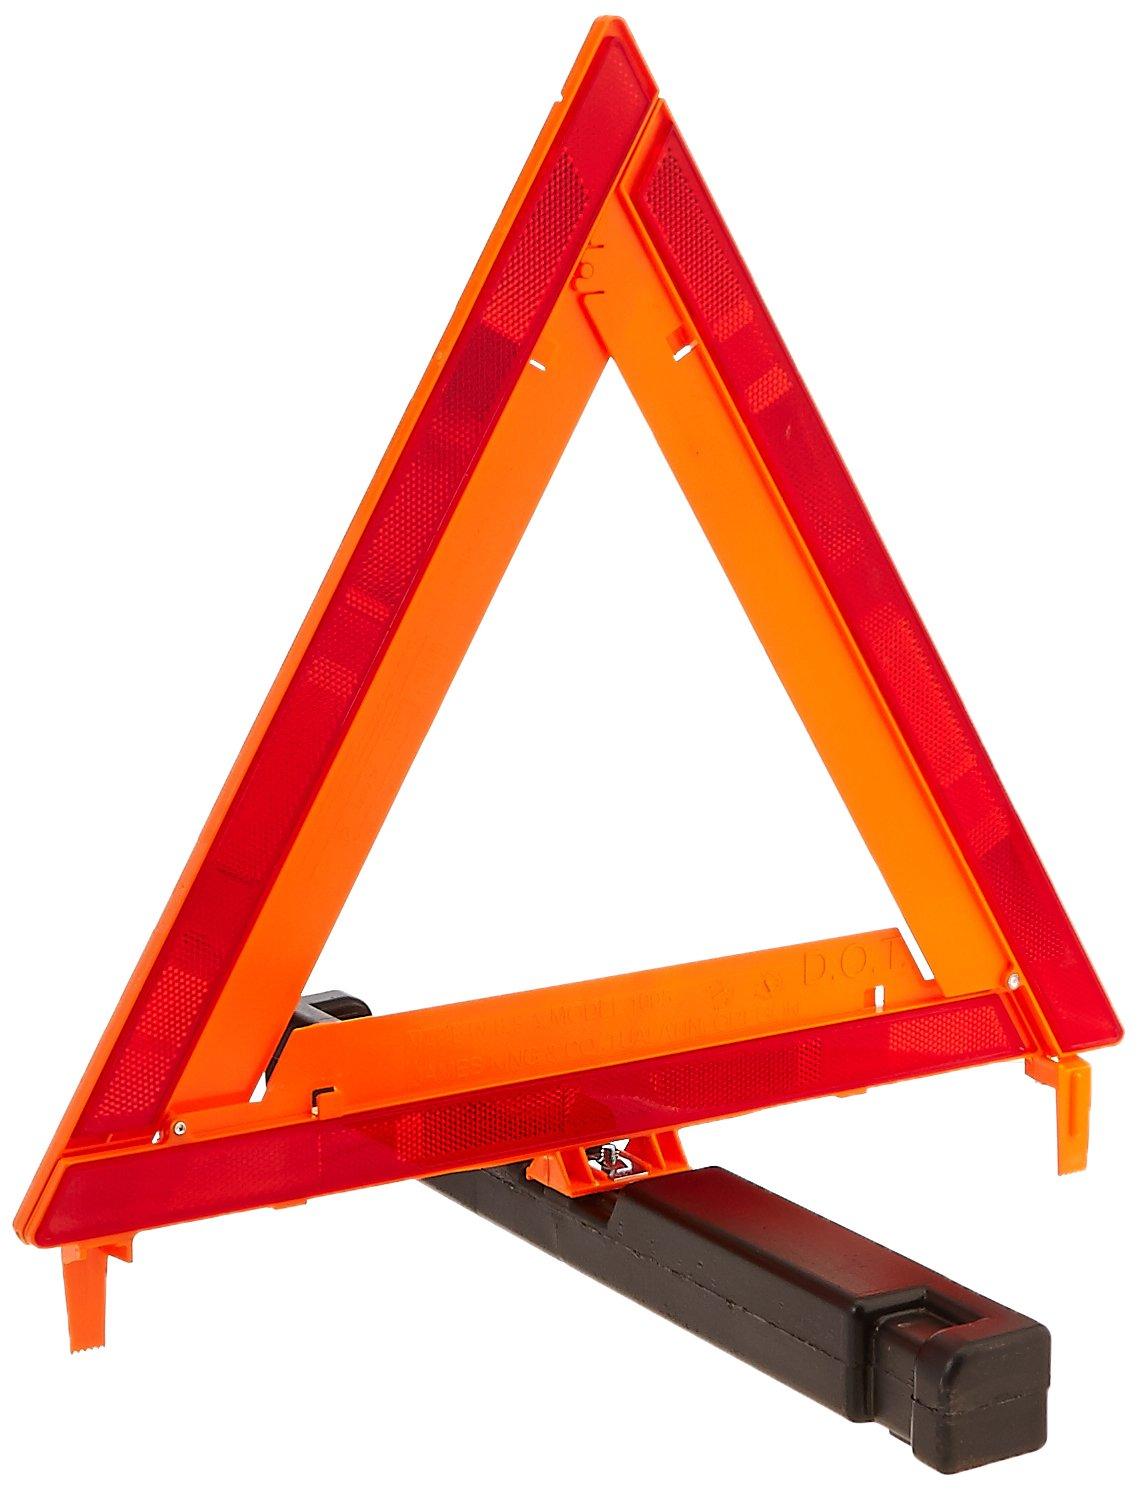 James King 1005-1 Warning Triangle, (Set of 3)